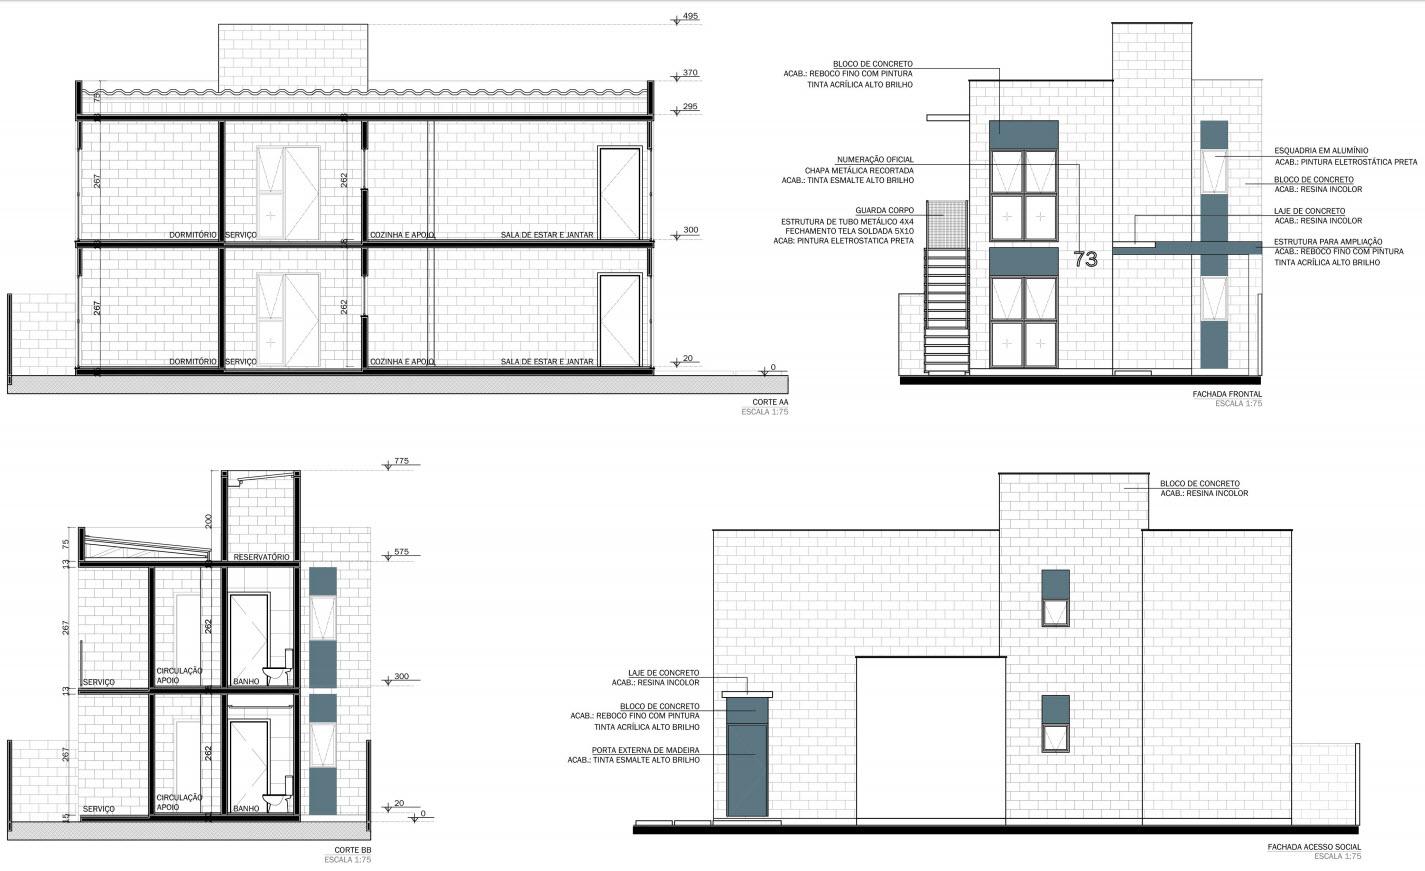 Planos de casas peque as con posibilidad de ampliaci n propuesta arquitect nica moderna mundo - Planos de casas pequenas ...